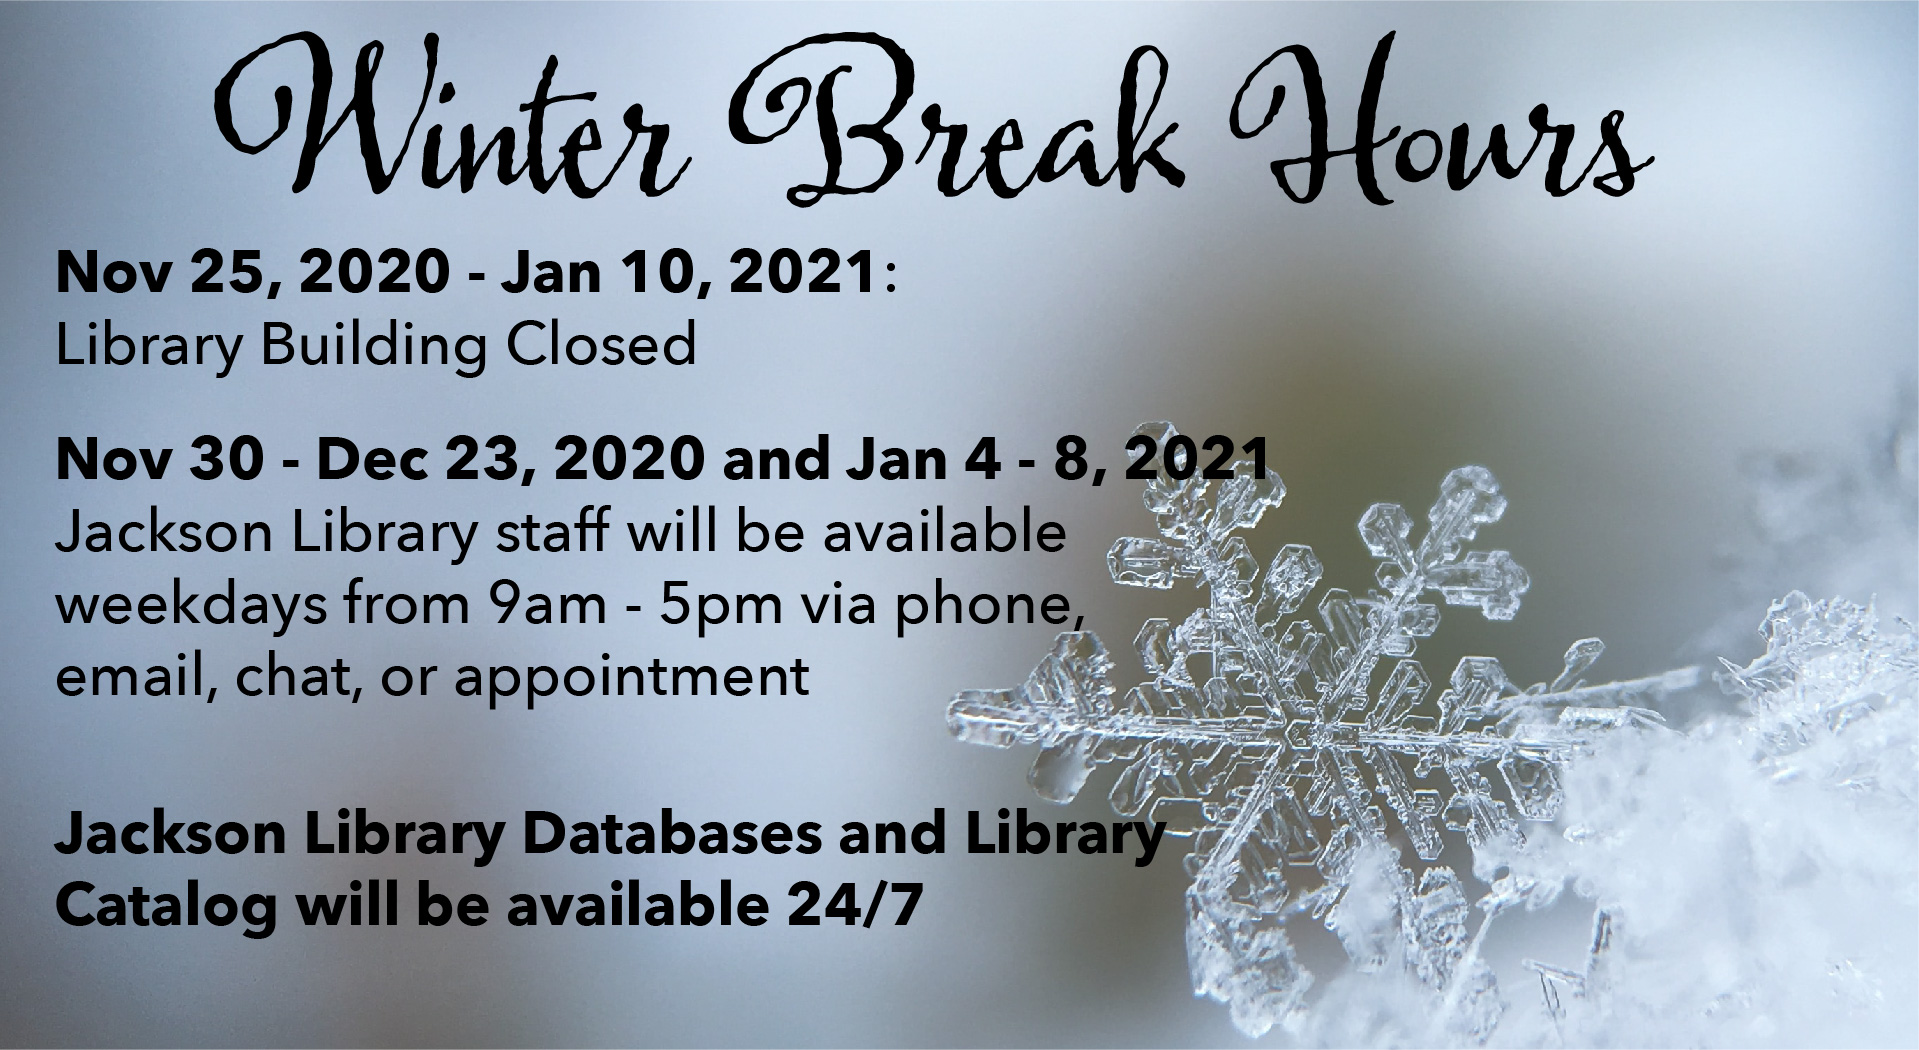 Winder Break hours, library hours